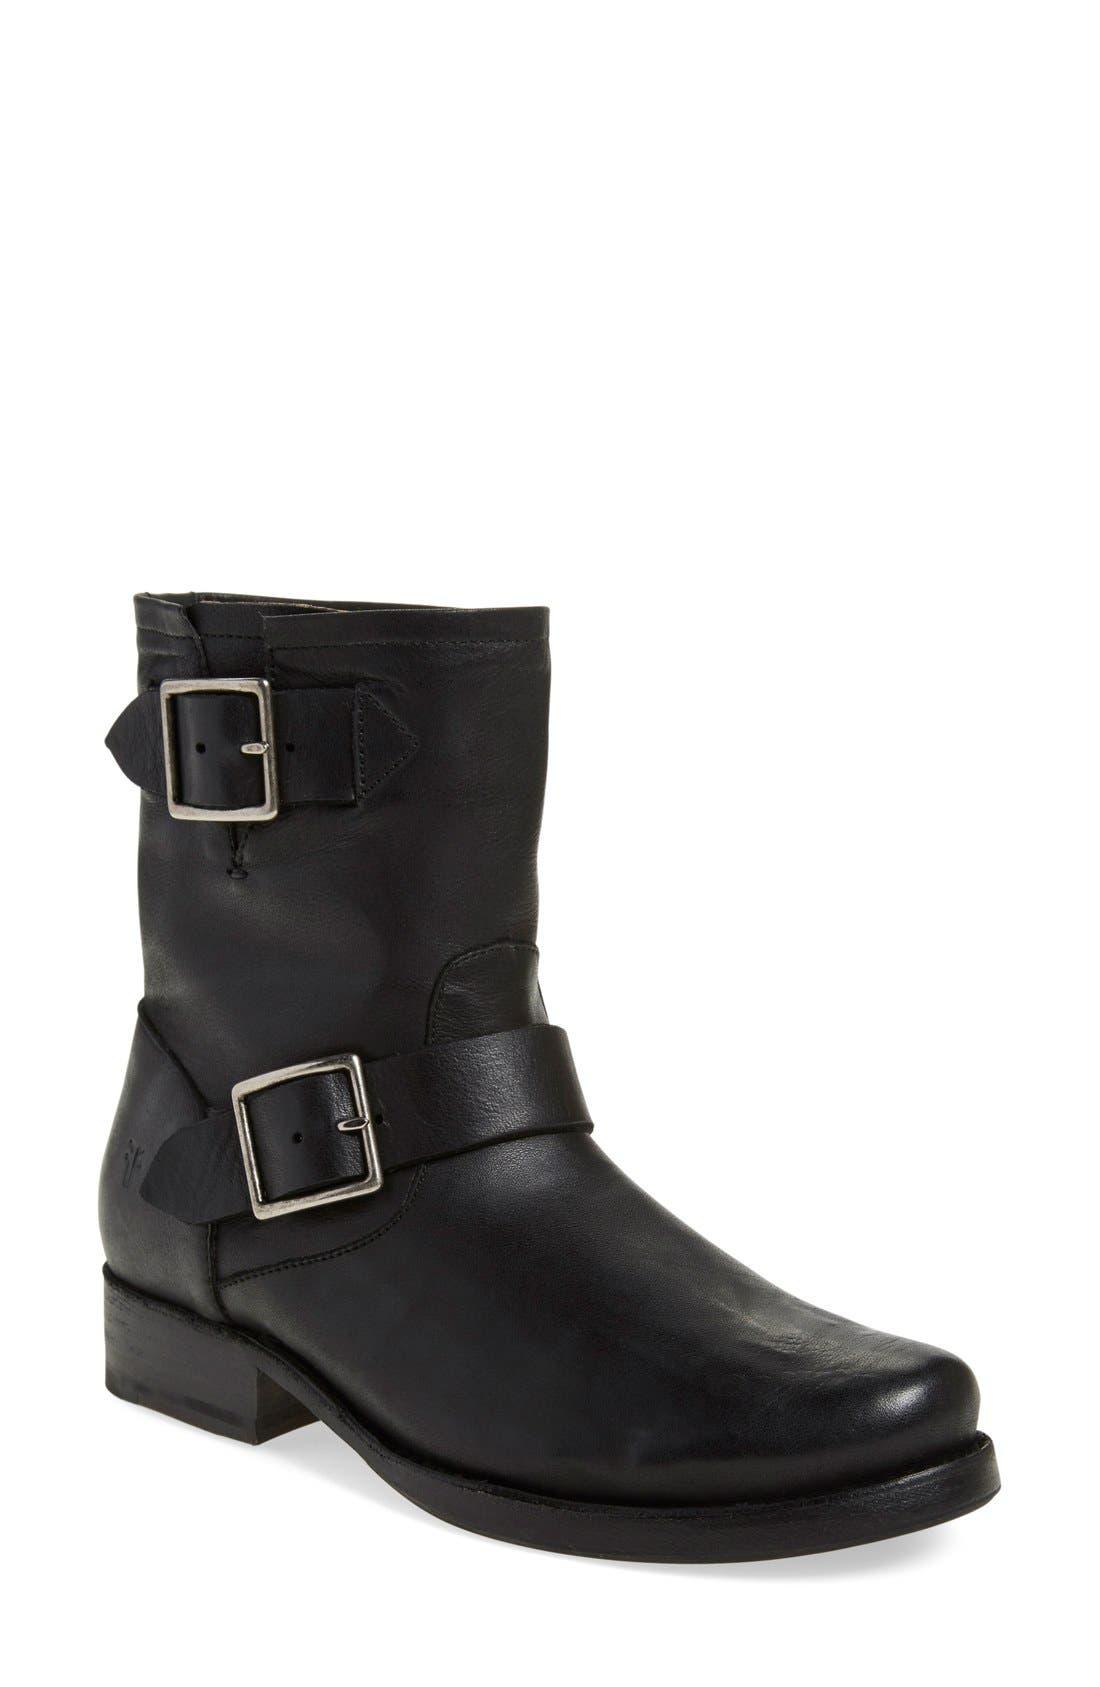 Main Image - Frye 'Vicky Engineer' Boot (Women)